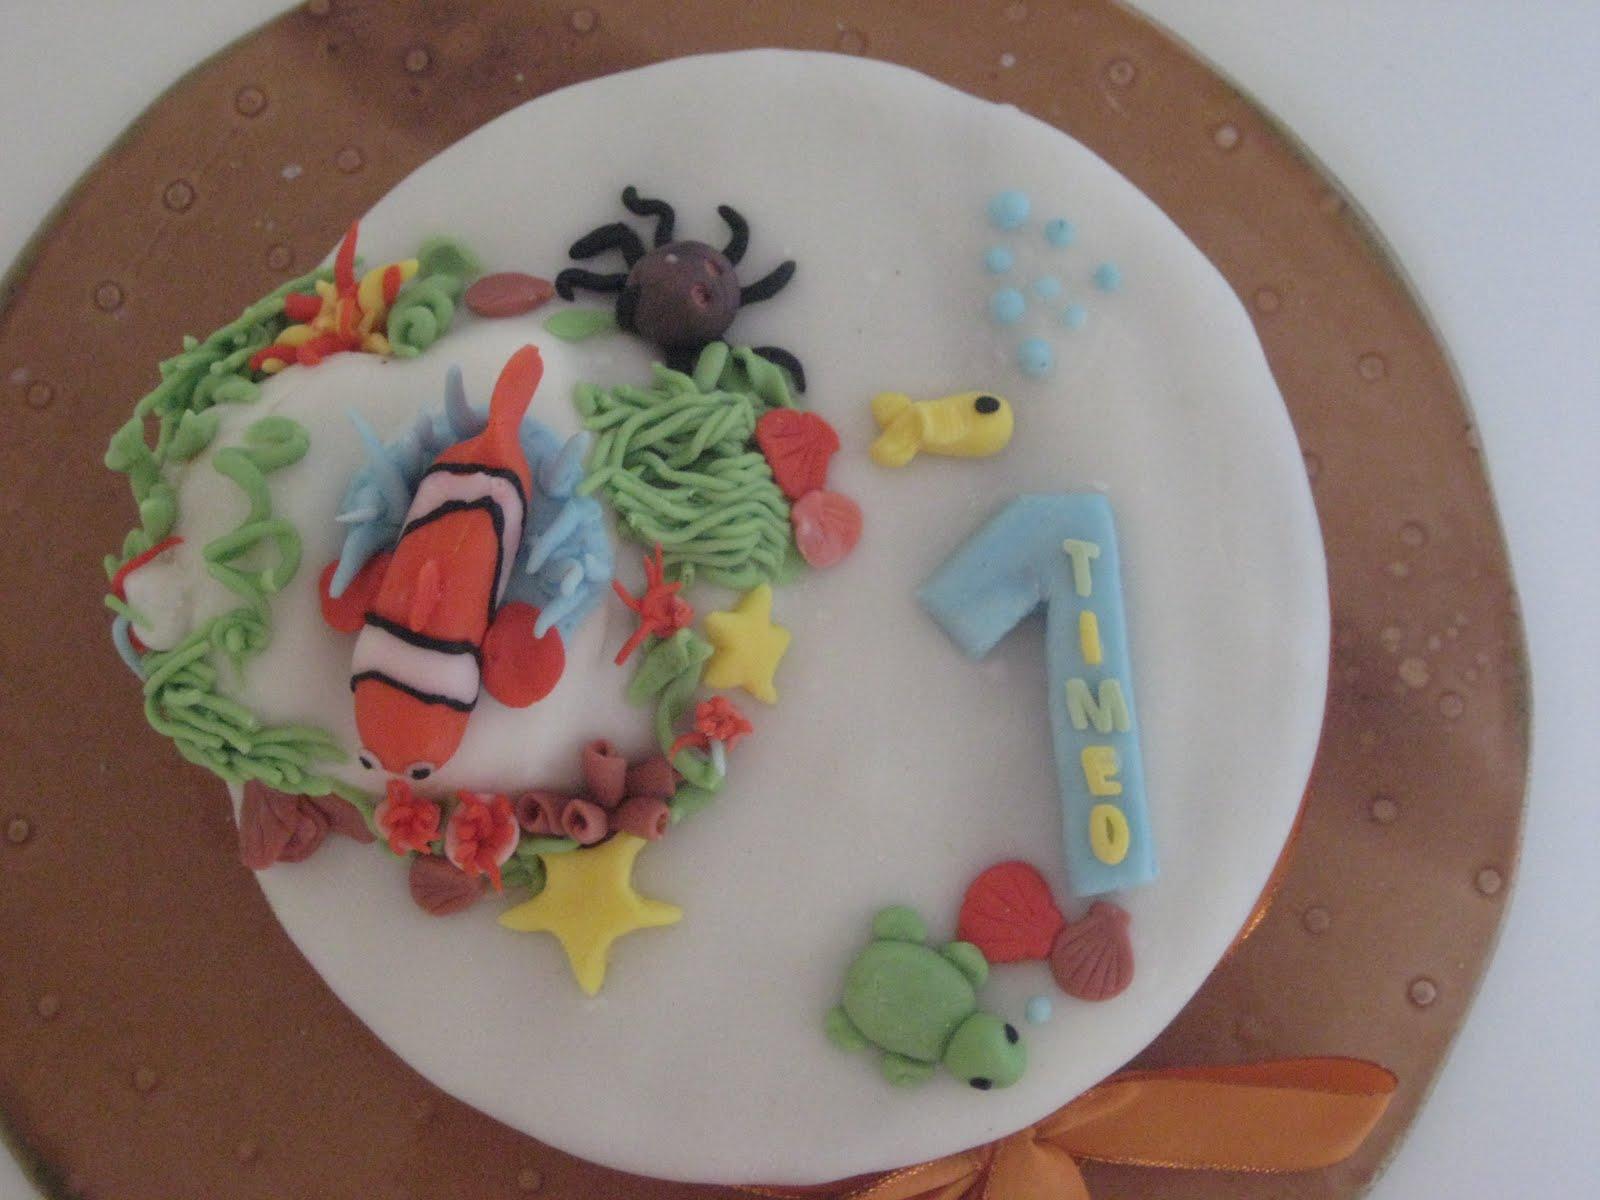 Heavenly Sugary Birthday Cake 1 year old baby boy